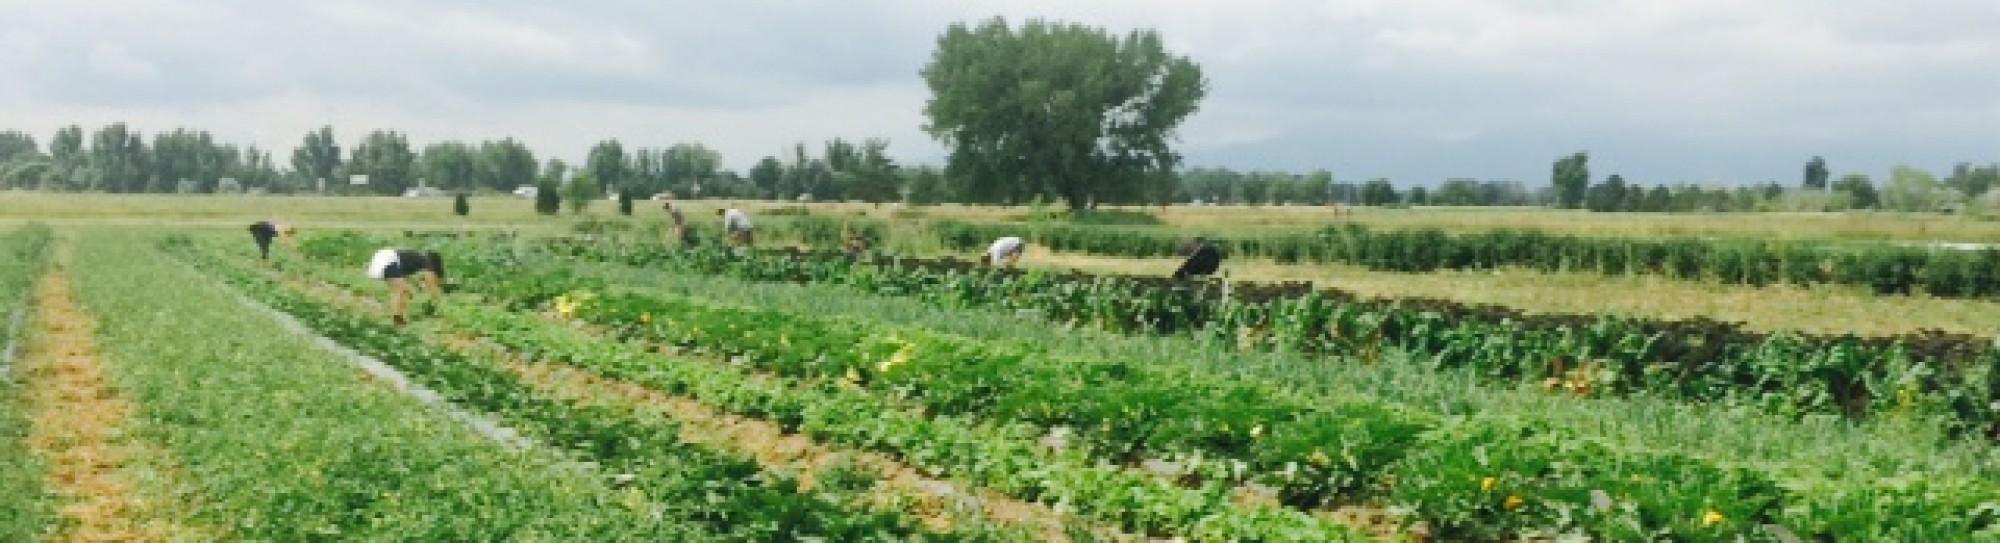 plowshares community farm